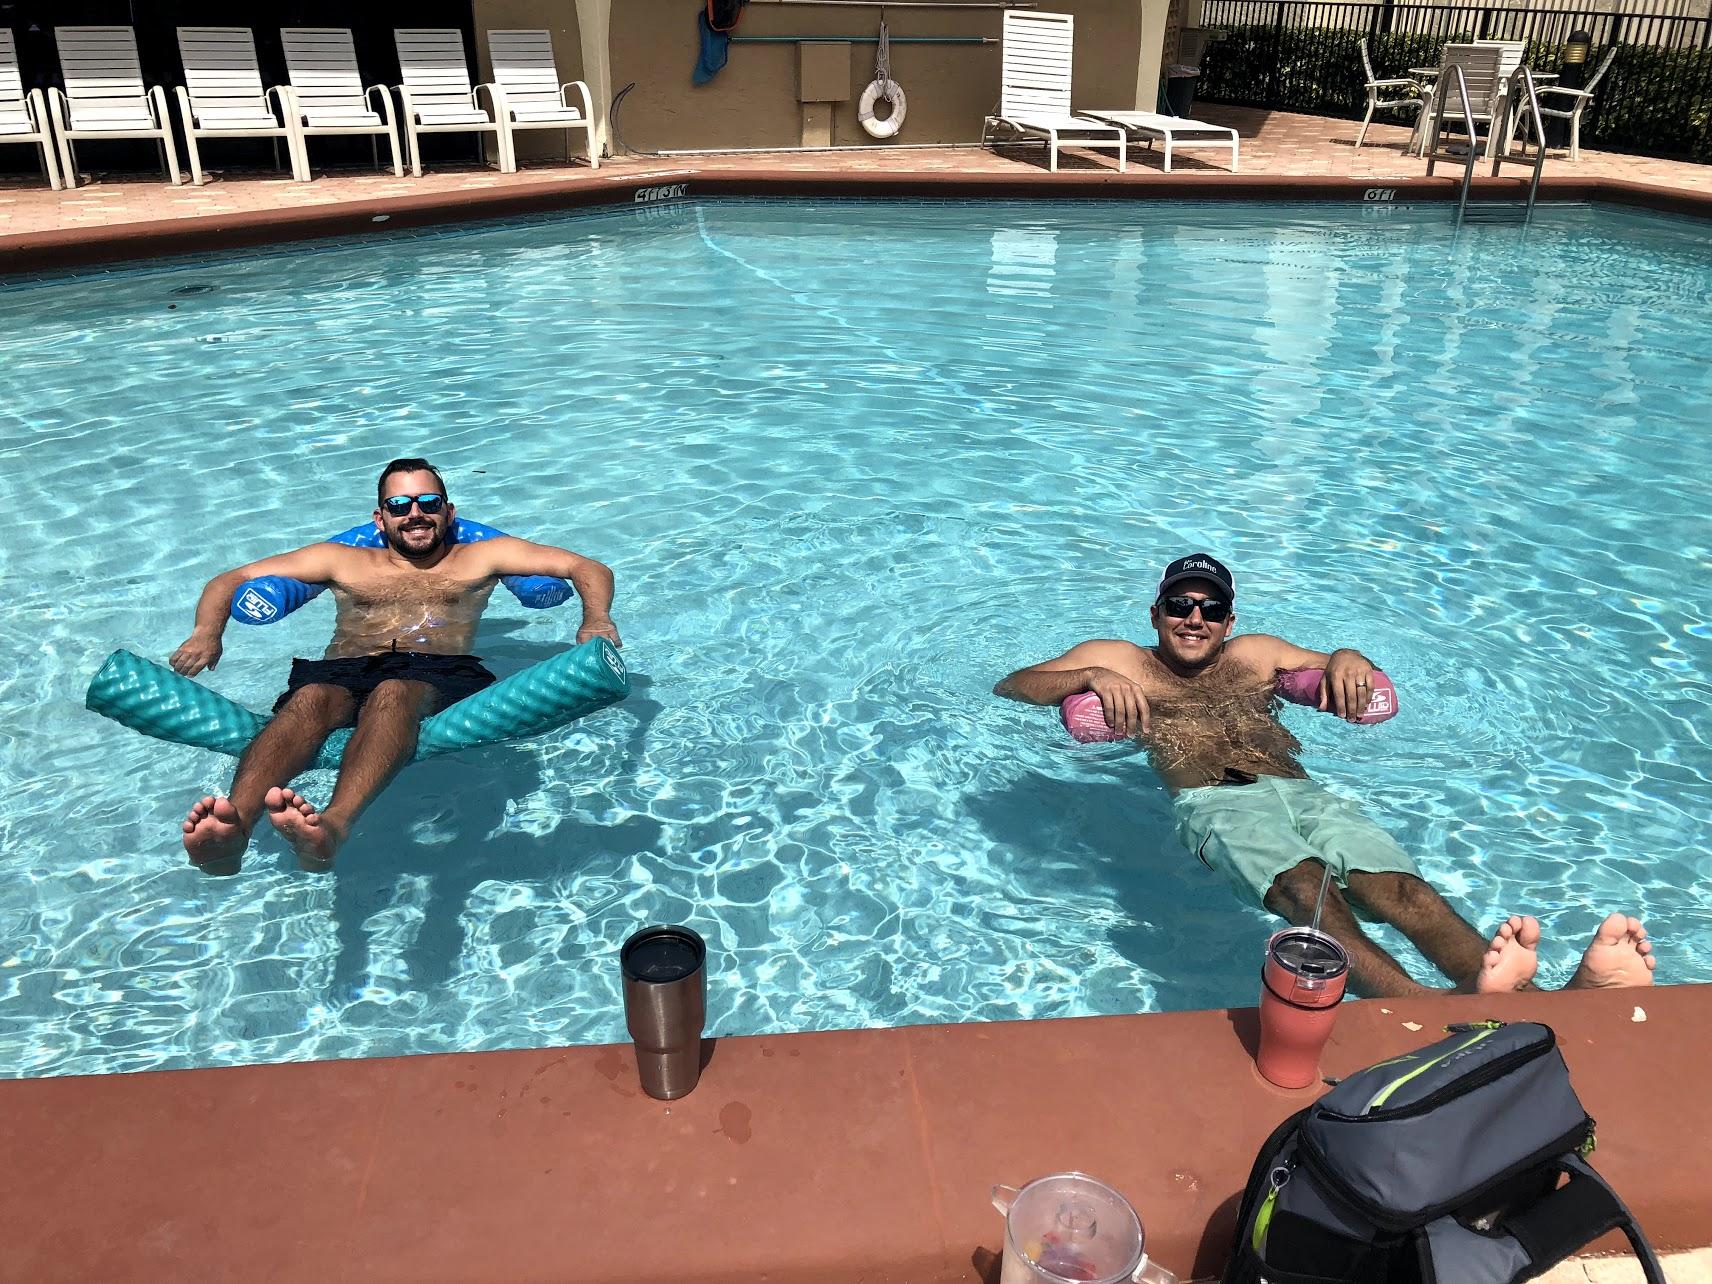 Boca Raton pool day